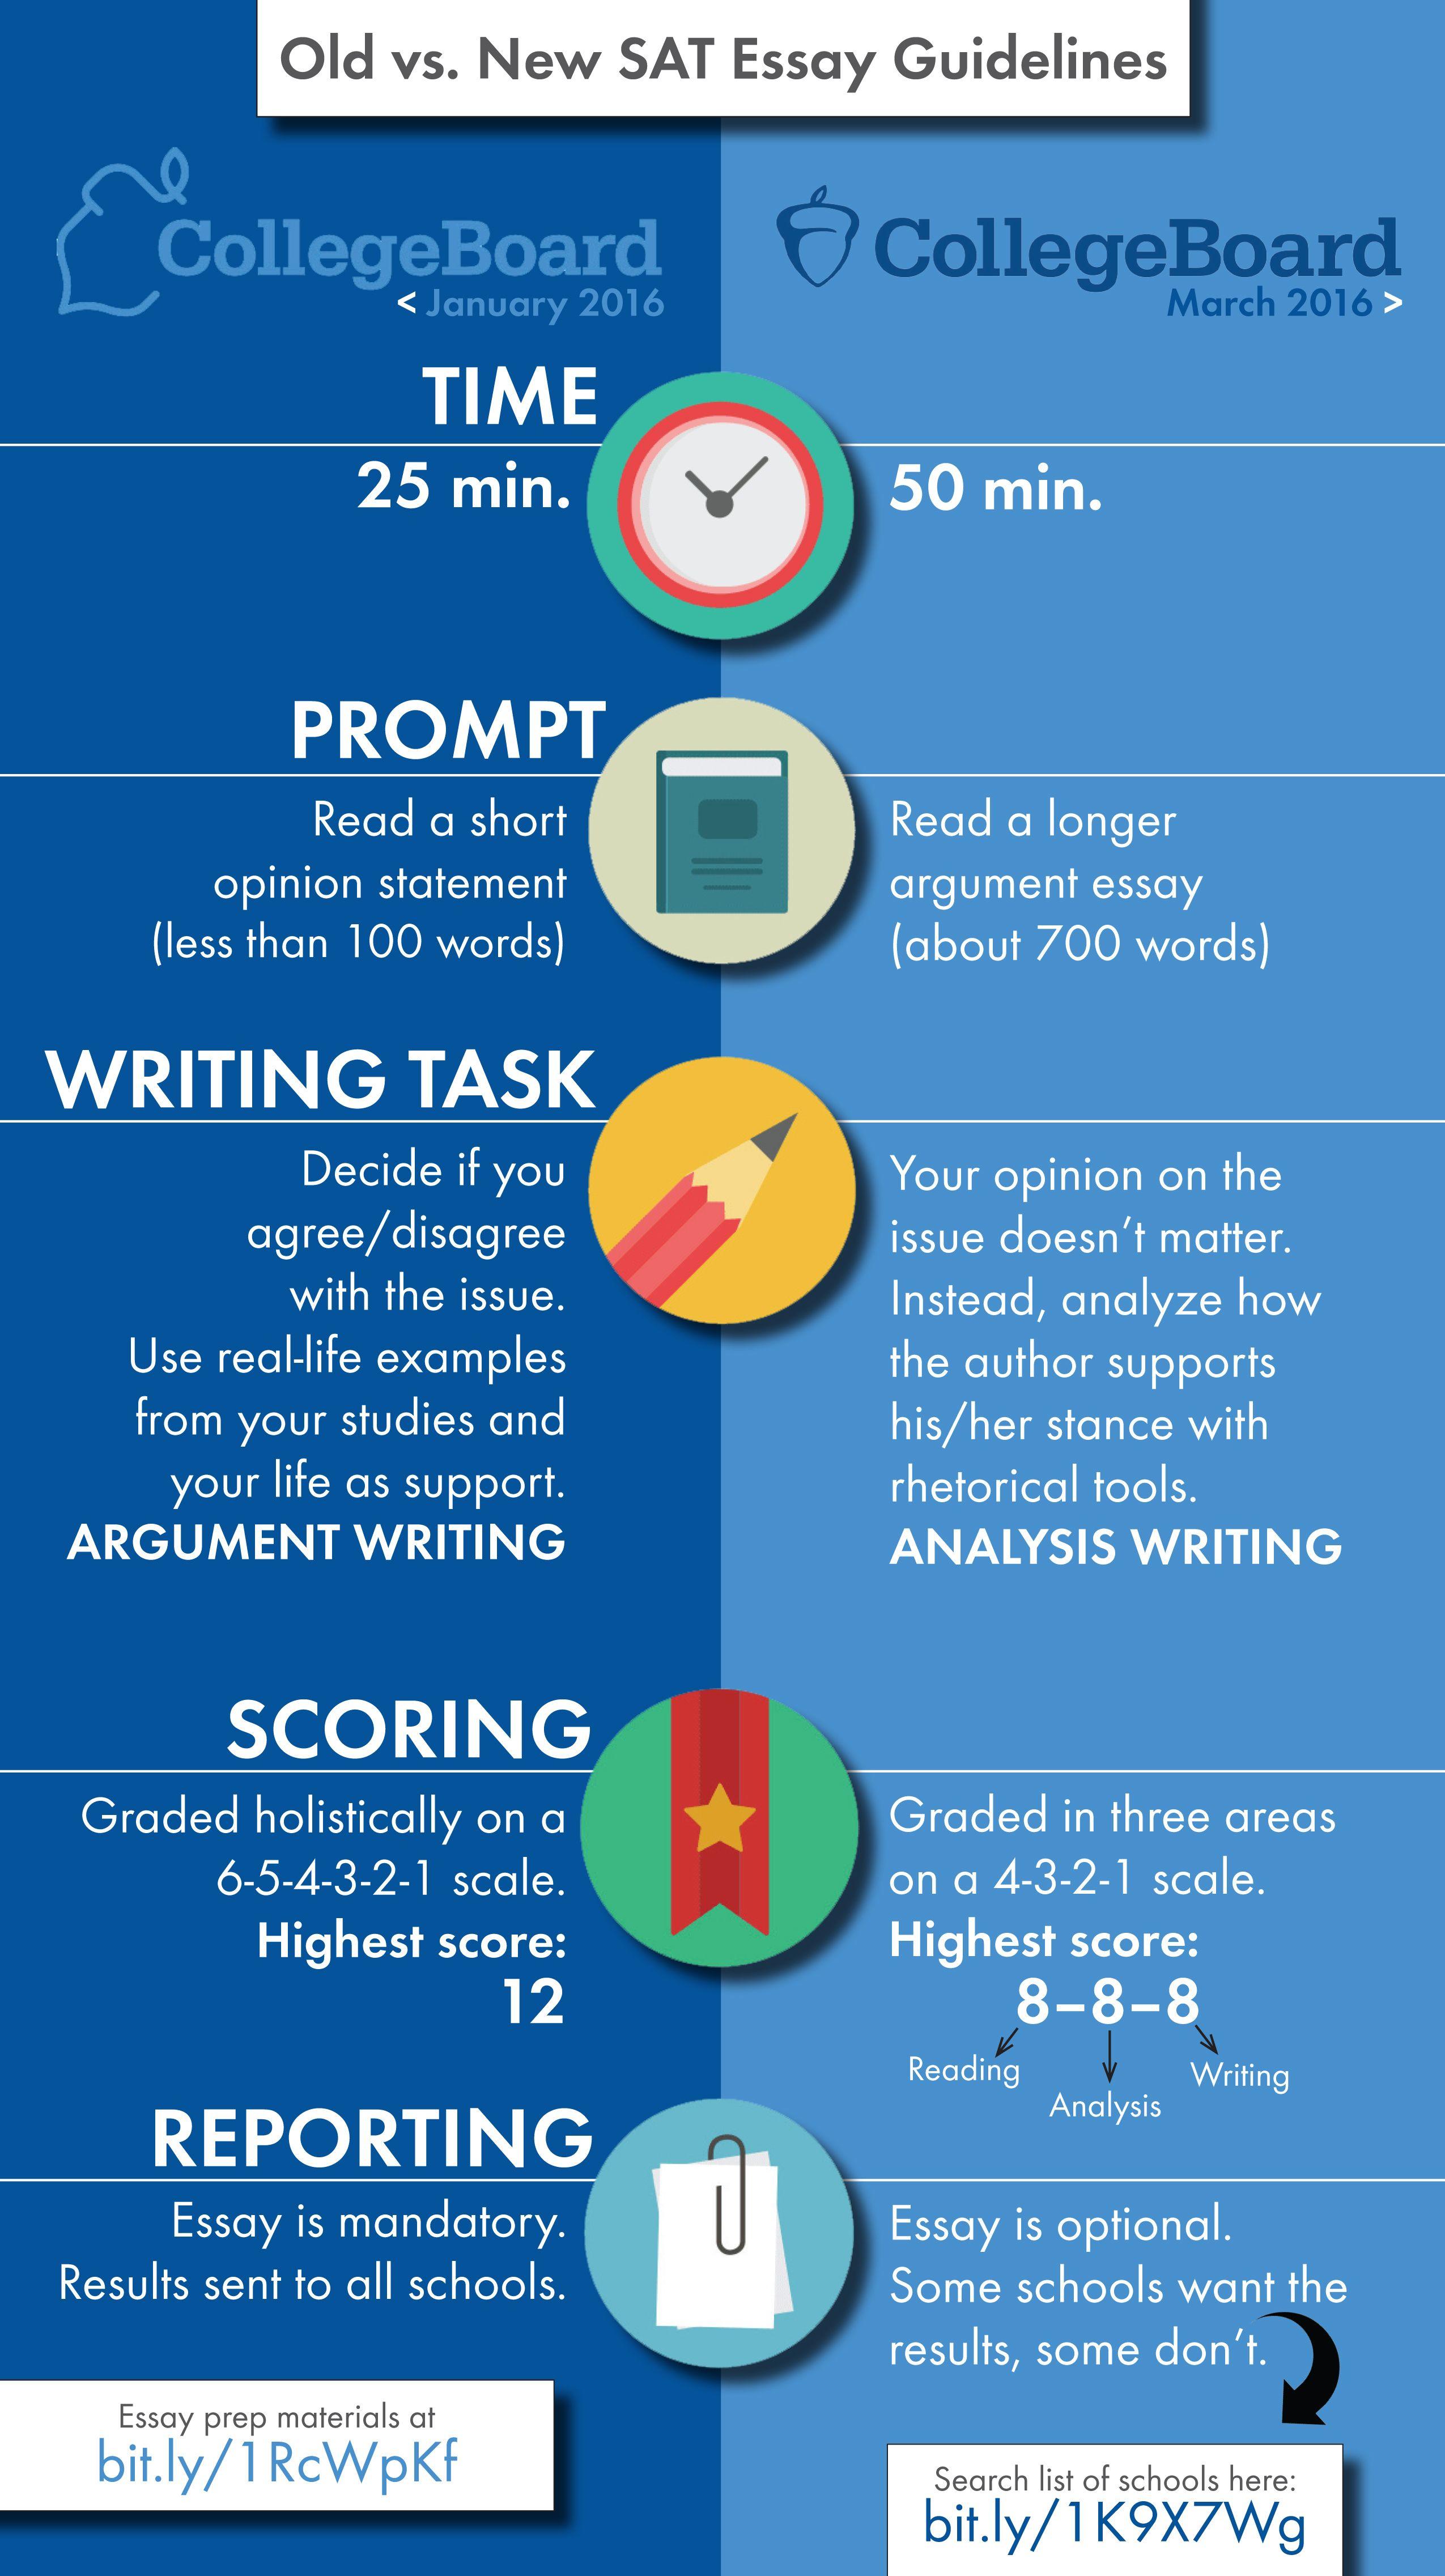 016 Sat Essay Tips Example Singular Pdf Writing Prepscholar Full